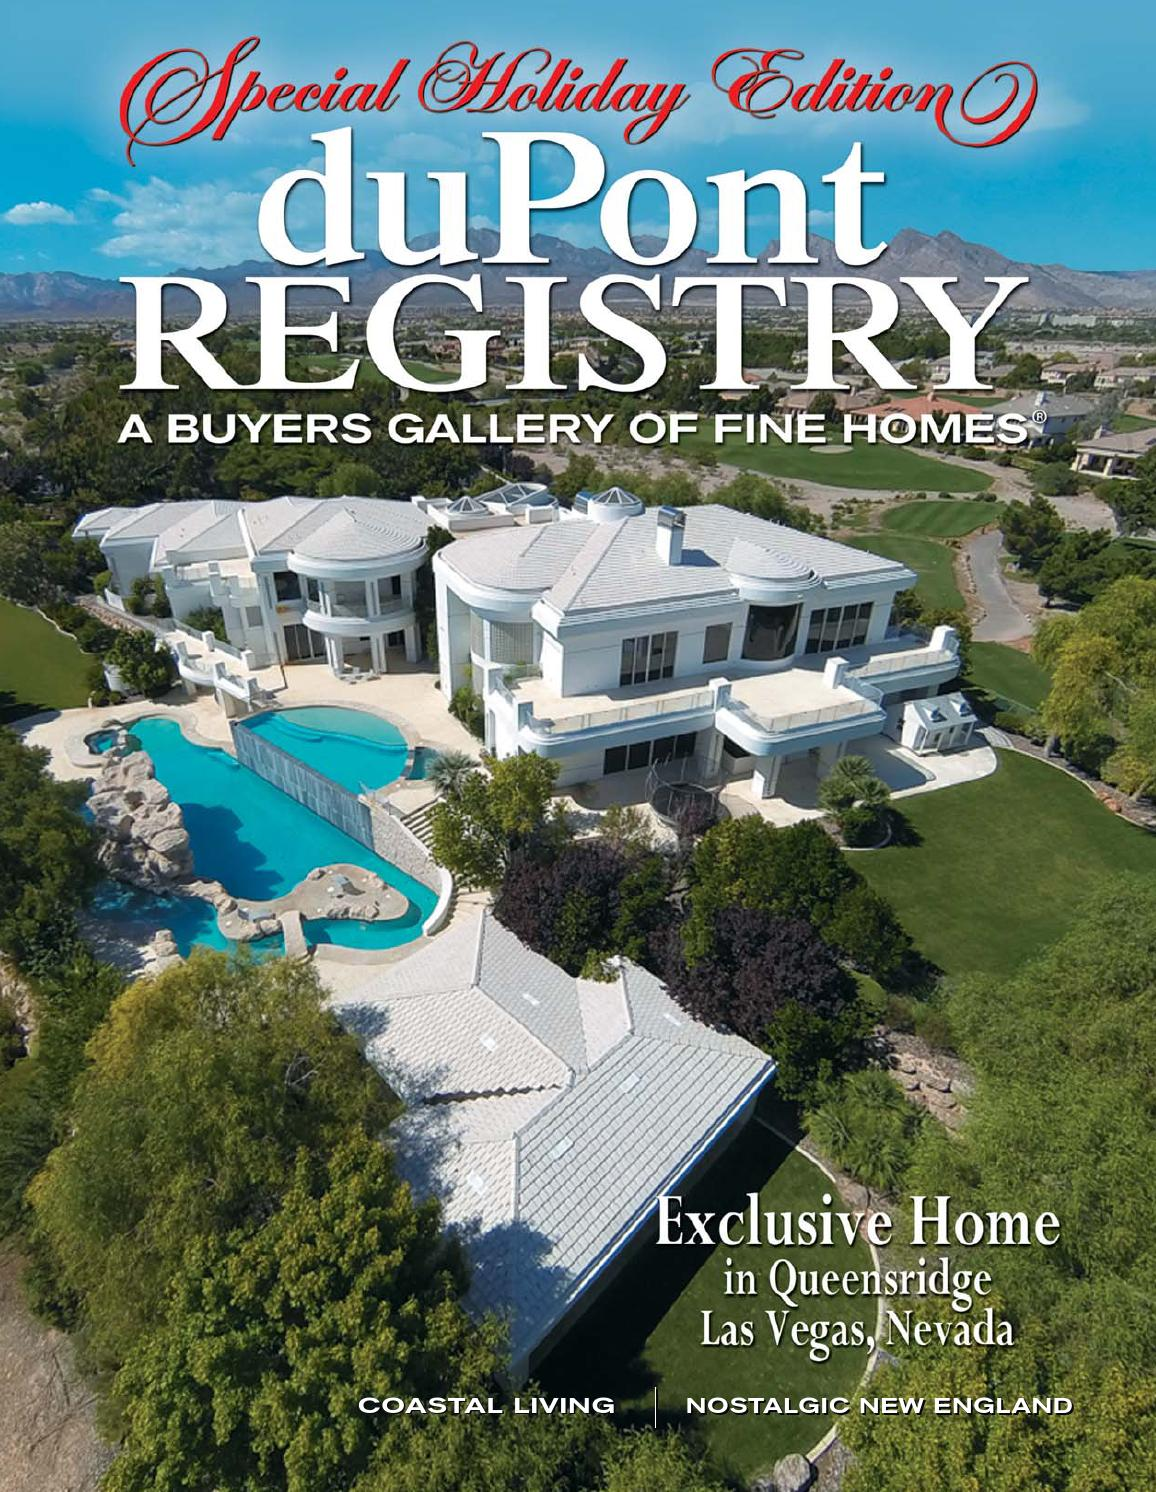 duPontREGISTRY Homes December 2014 by duPont REGISTRY issuu